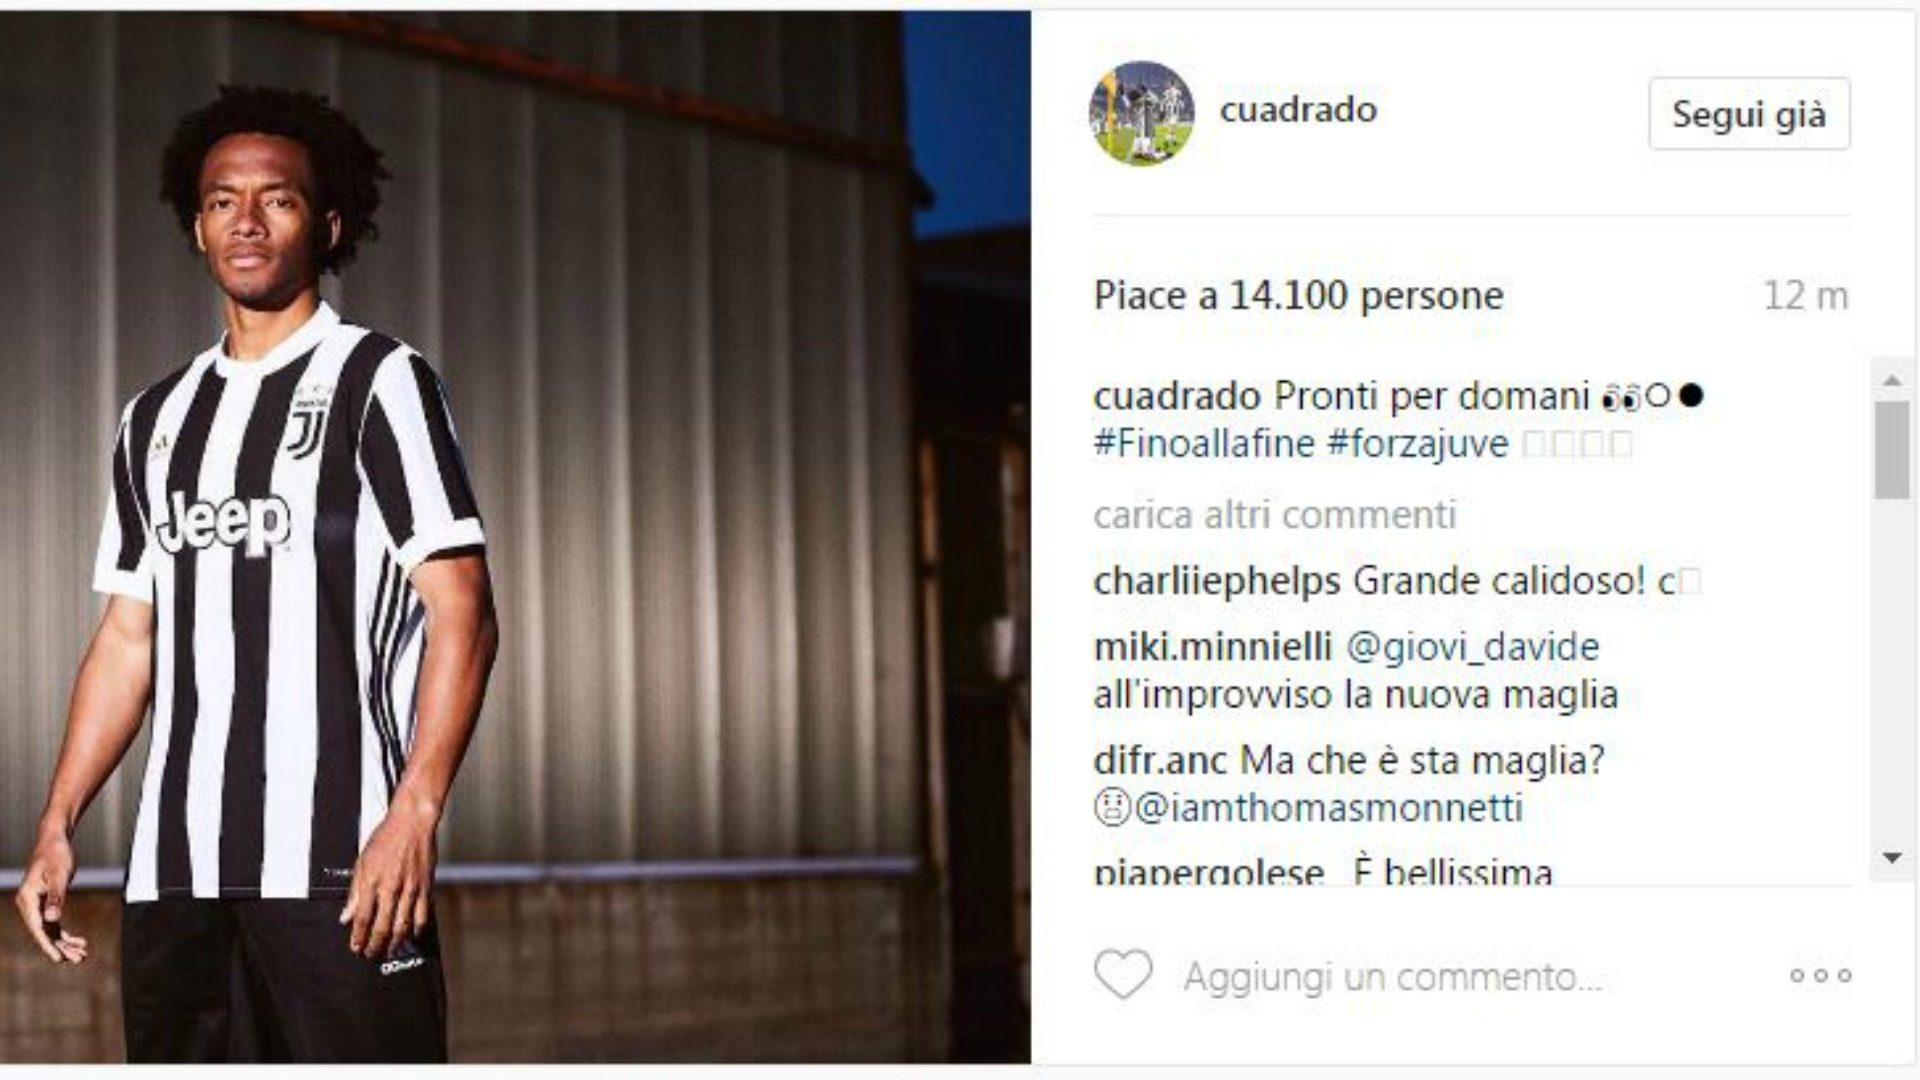 Cuadrado gaffe sui social: svela la nuova maglia della Juventus FOTO